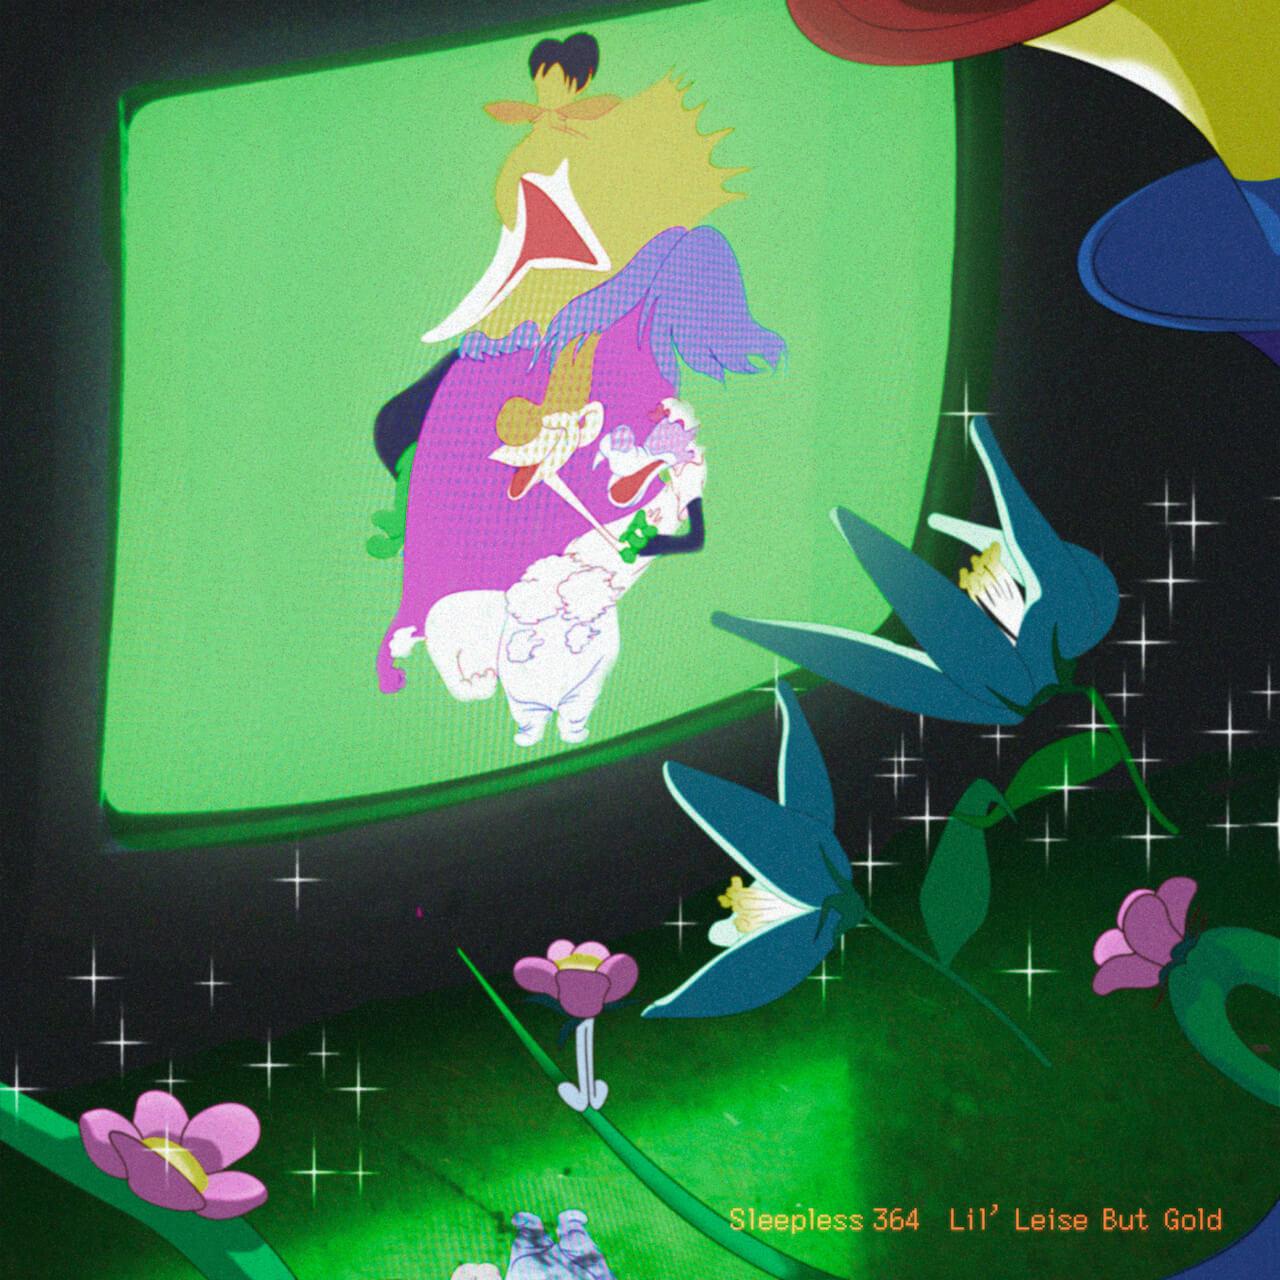 Lil'Leise But Gold、KMがフルプロデュースを務めた1st EP『Sleepless 364』をリリース YouthQuake・udaiが手掛けたMVも公開に music210324-lilleisebutgold-km-3